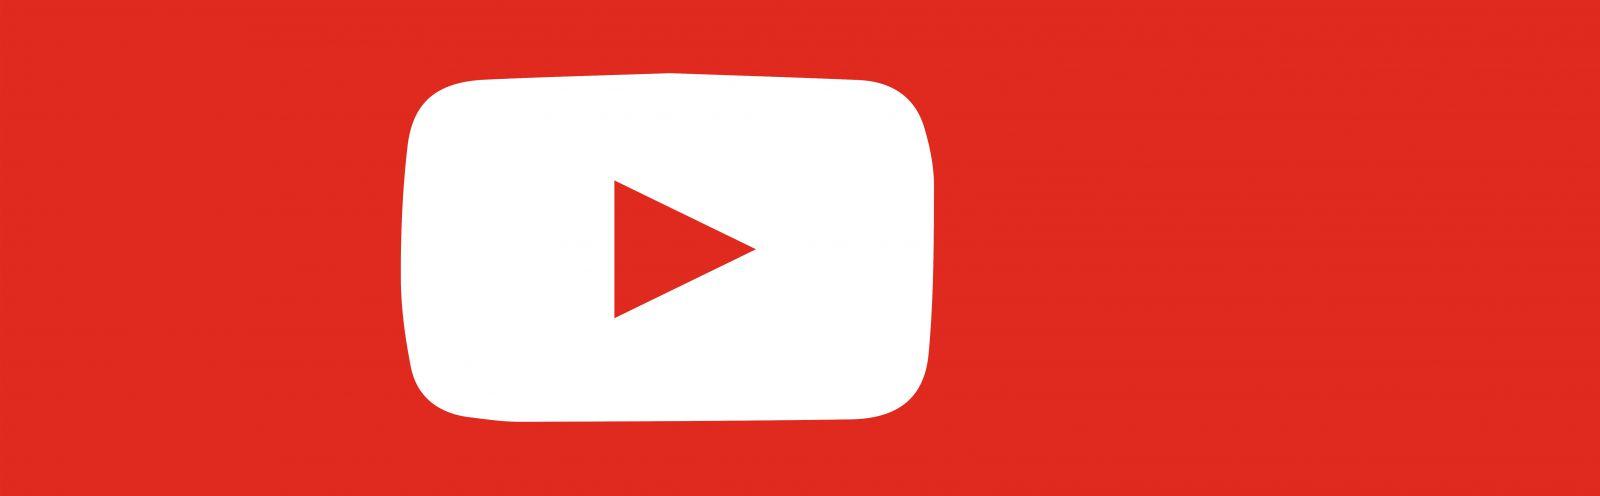 Fydiotheek op Youtube kanaal Fydio